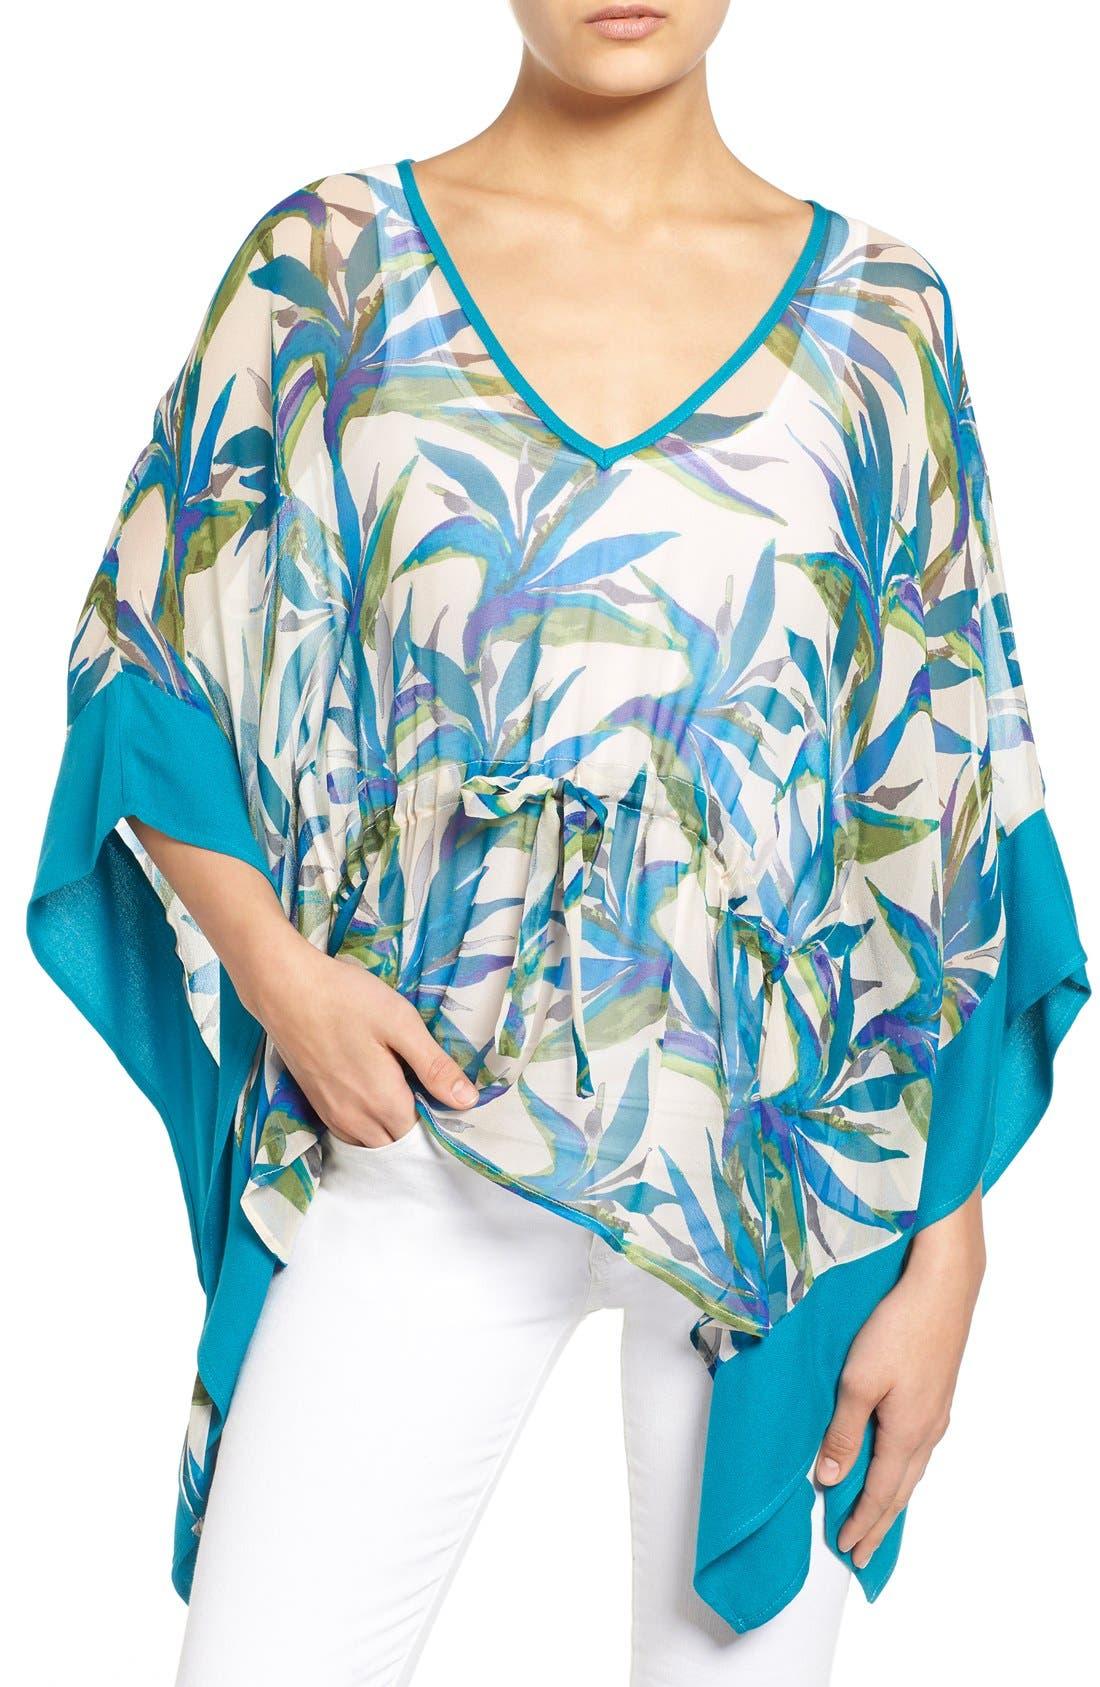 Alternate Image 1 Selected - Ella Moss Print Silk Tunic Top